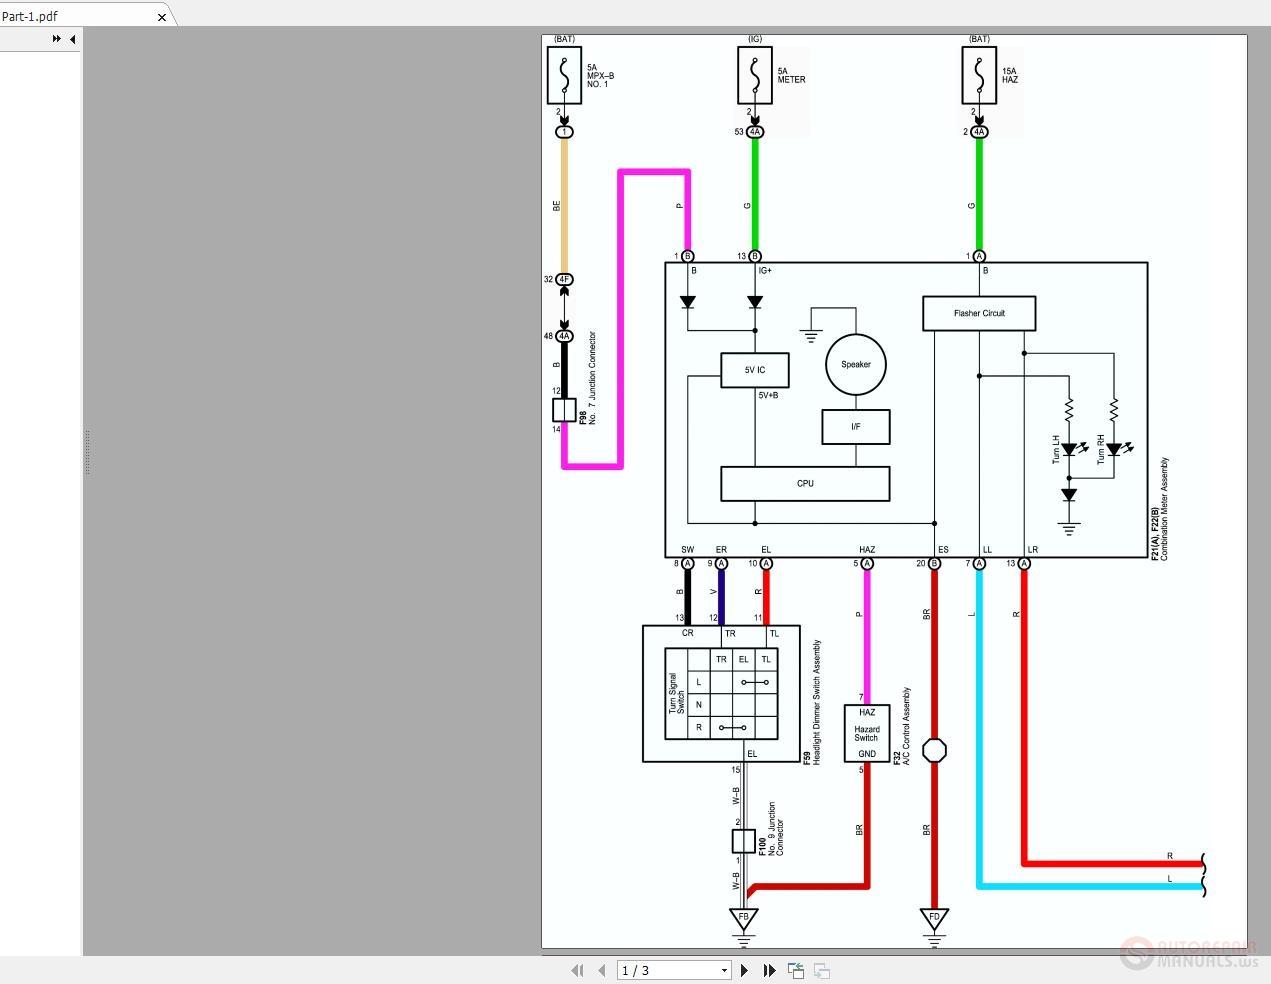 2005 Toyota Highlander Wiring Diagram from img.autorepairmanuals.ws